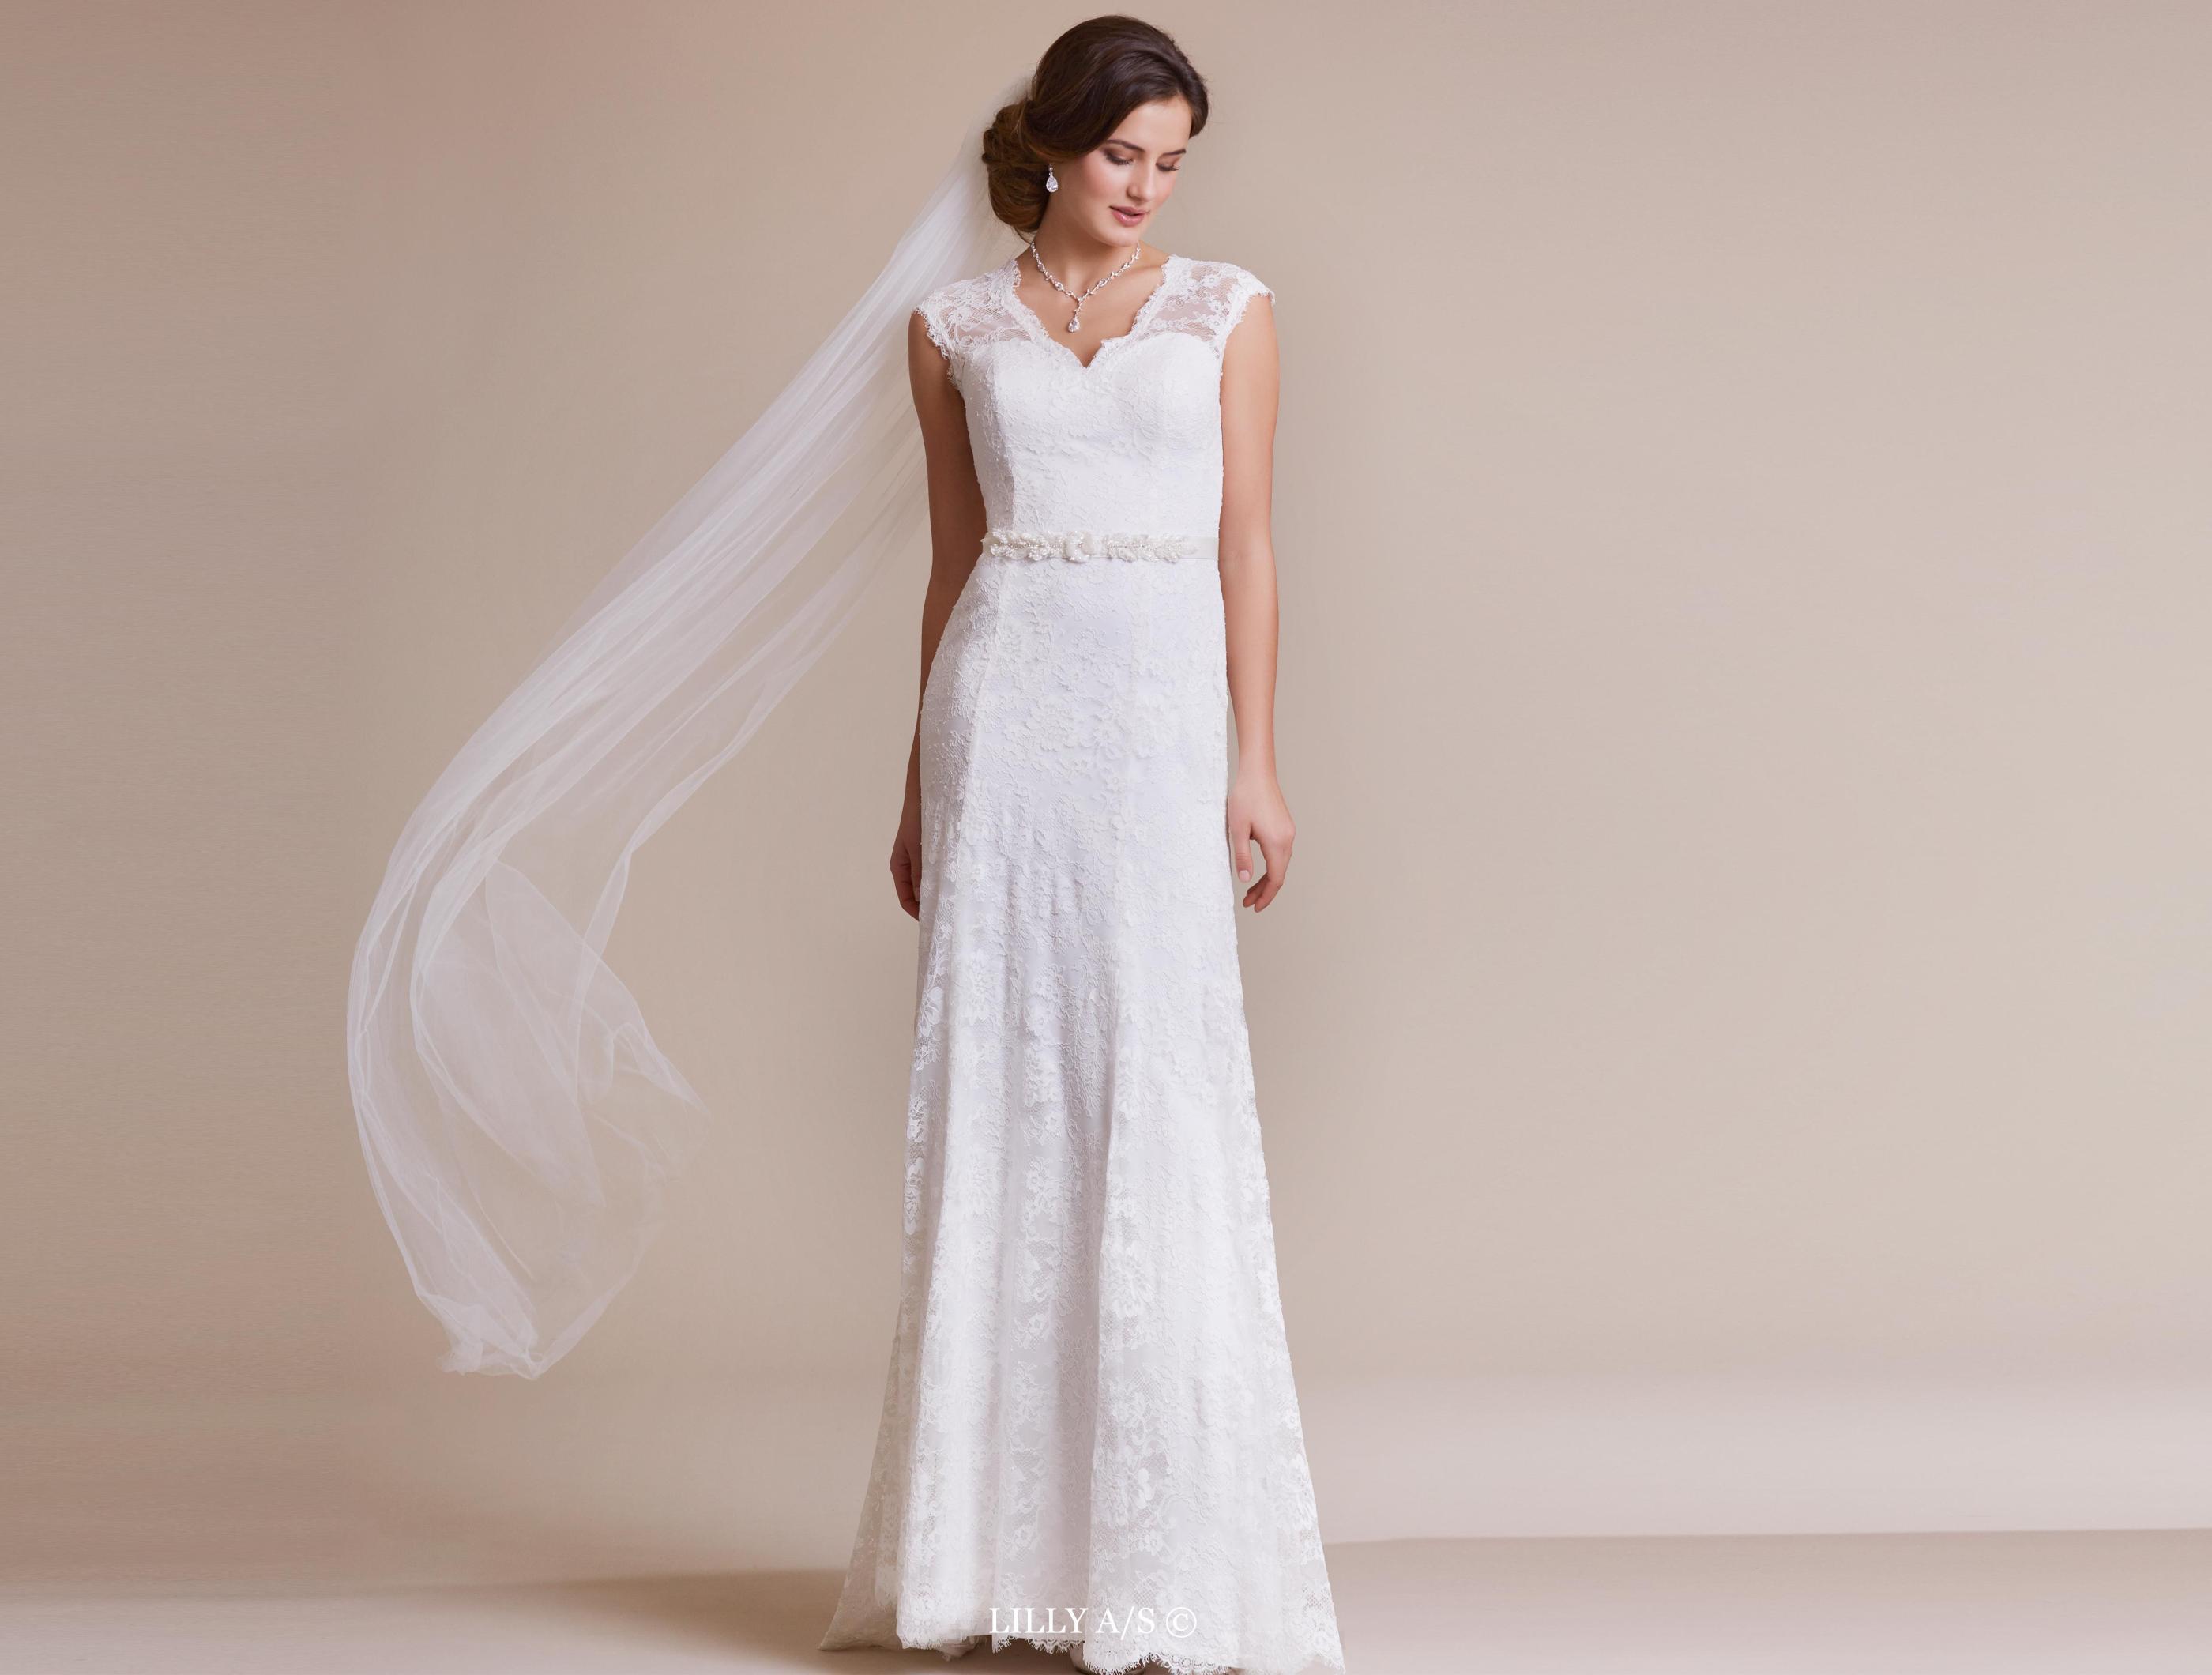 Weddingdress In Soft Stretchy Lace